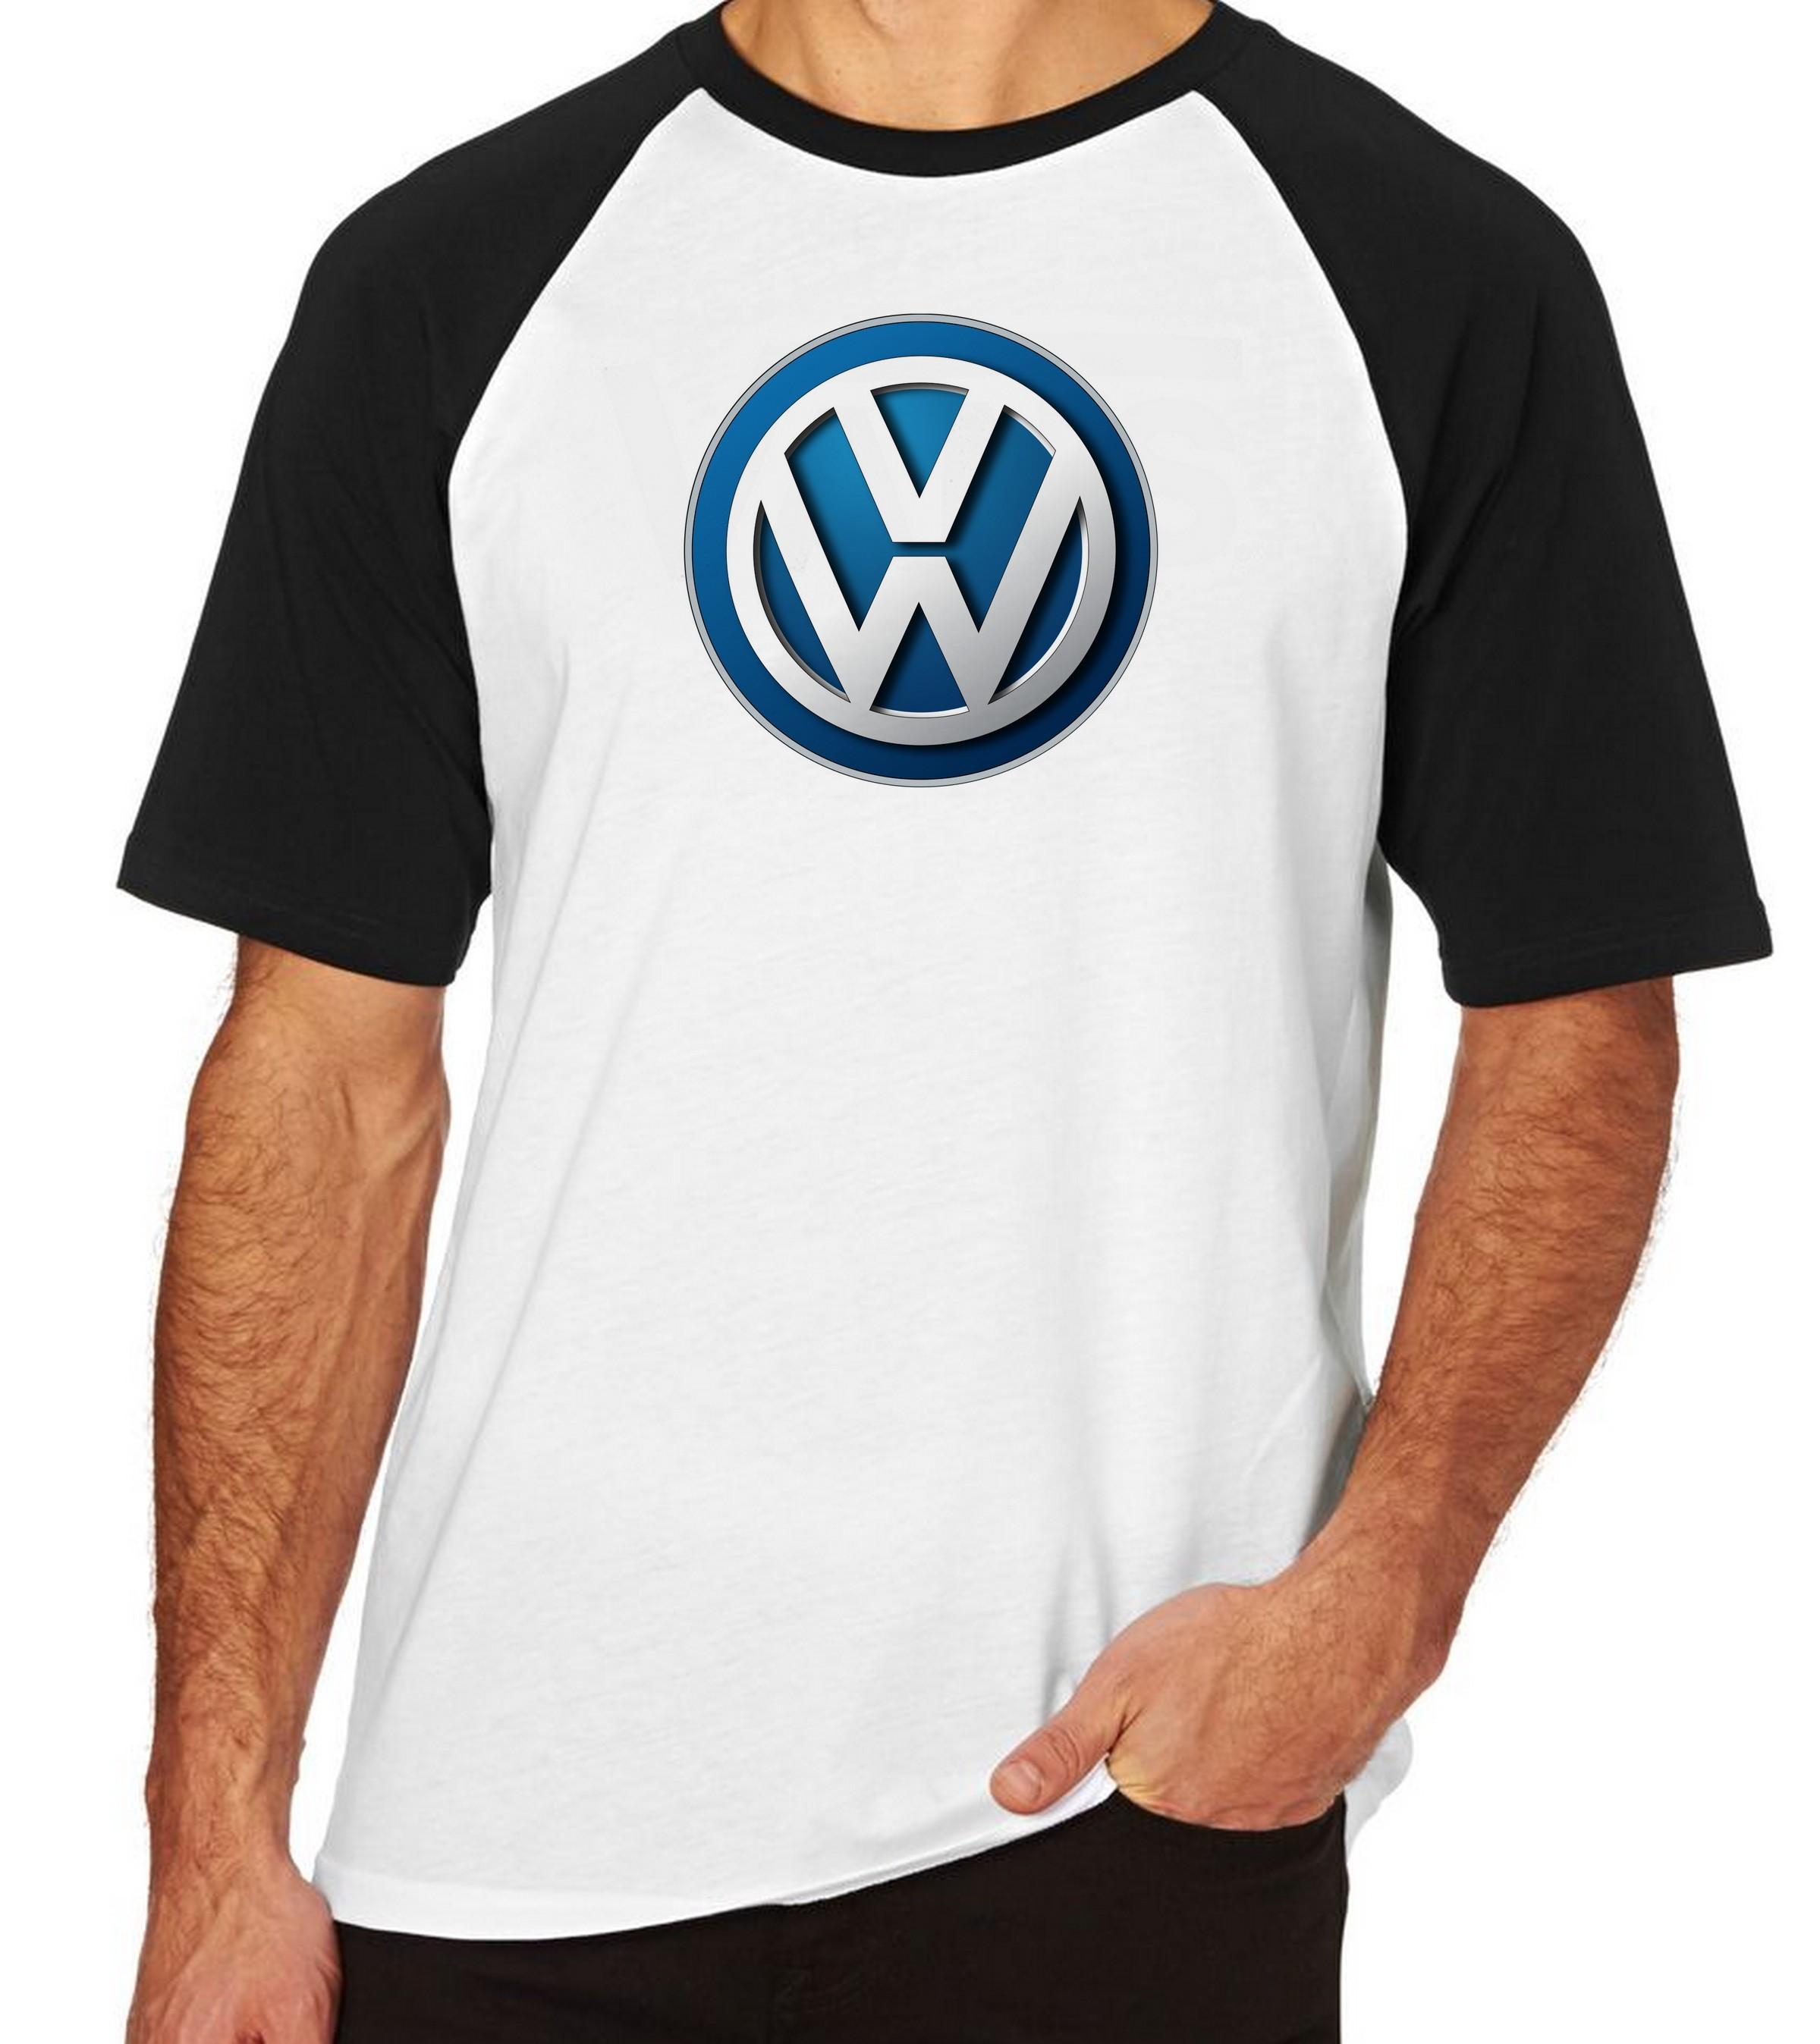 3b681051dc Camiseta Raglan Camisa Blusa VOLKSWAGEN Carro Golf Jetta no Elo7 ...